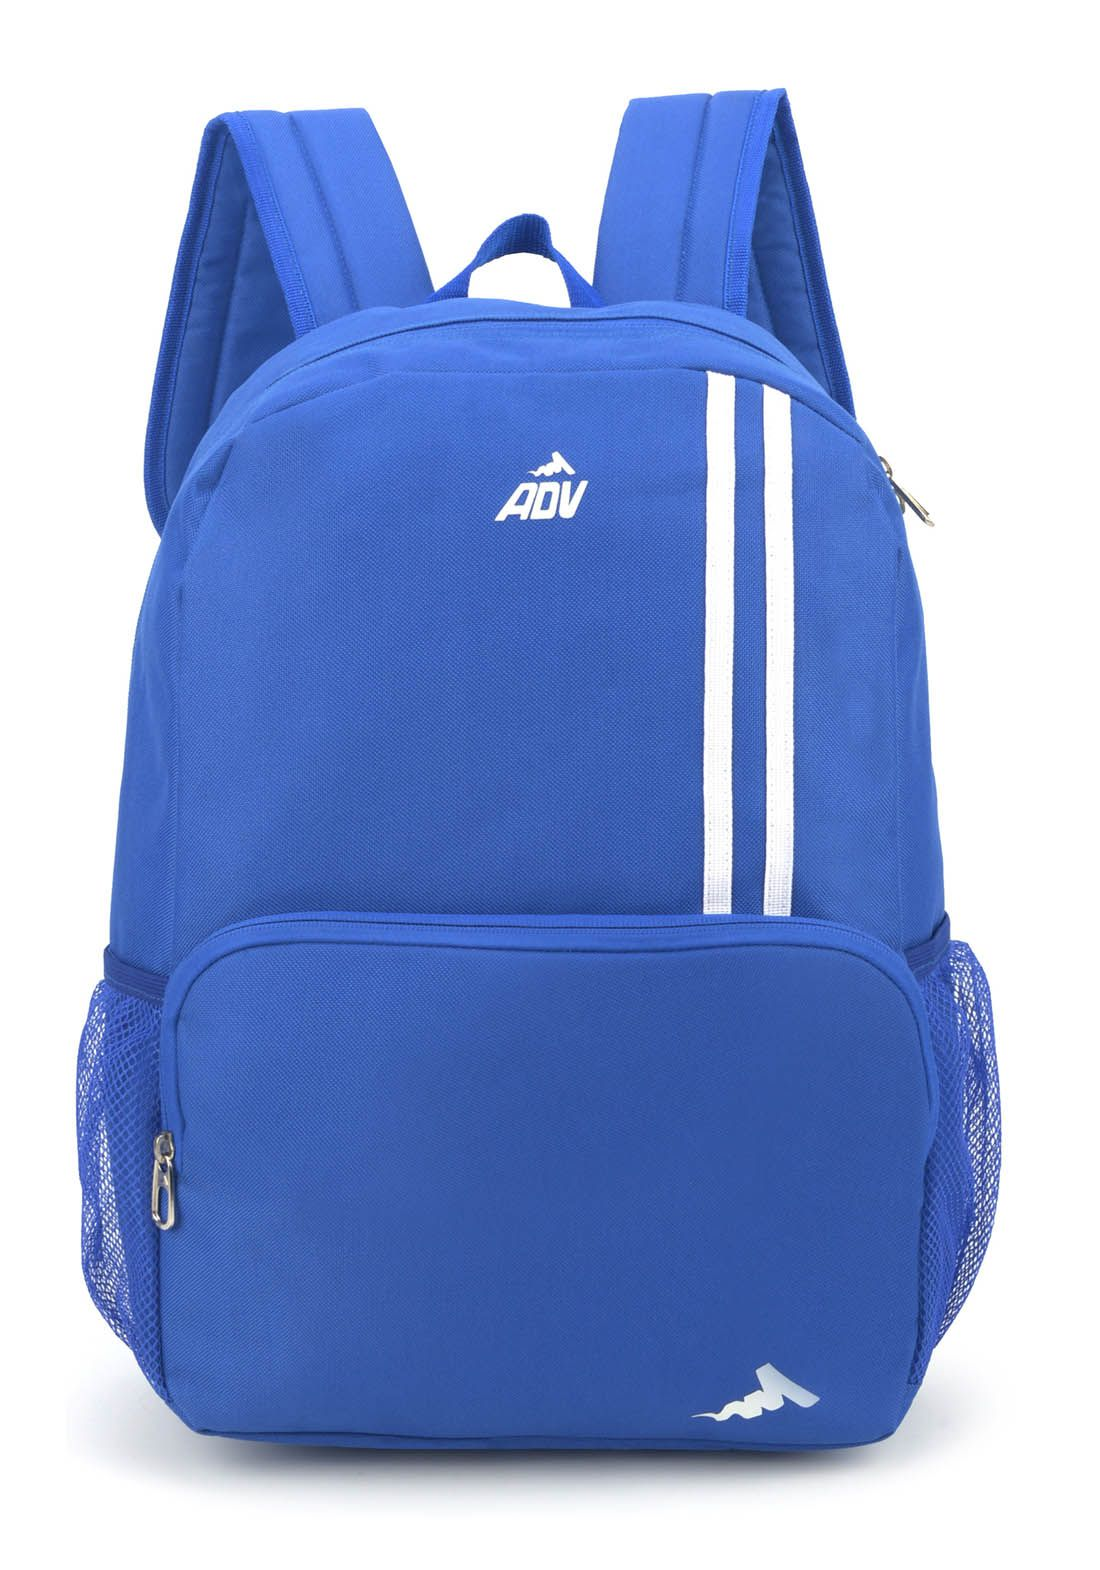 Mochila de Costas Adventteam Azul MS45661AV-AZ